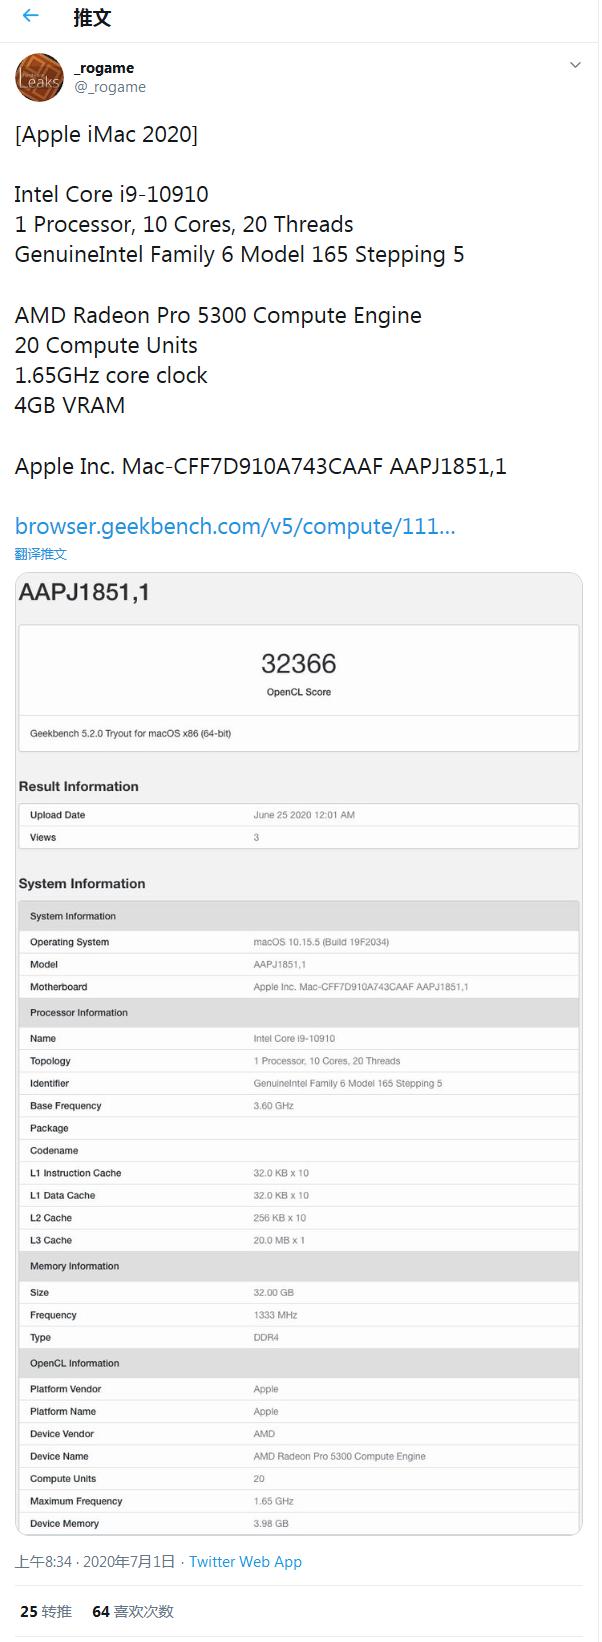 2020年款iMac跑分曝光:酷睿i9-10910+AMDRadeonPro5300